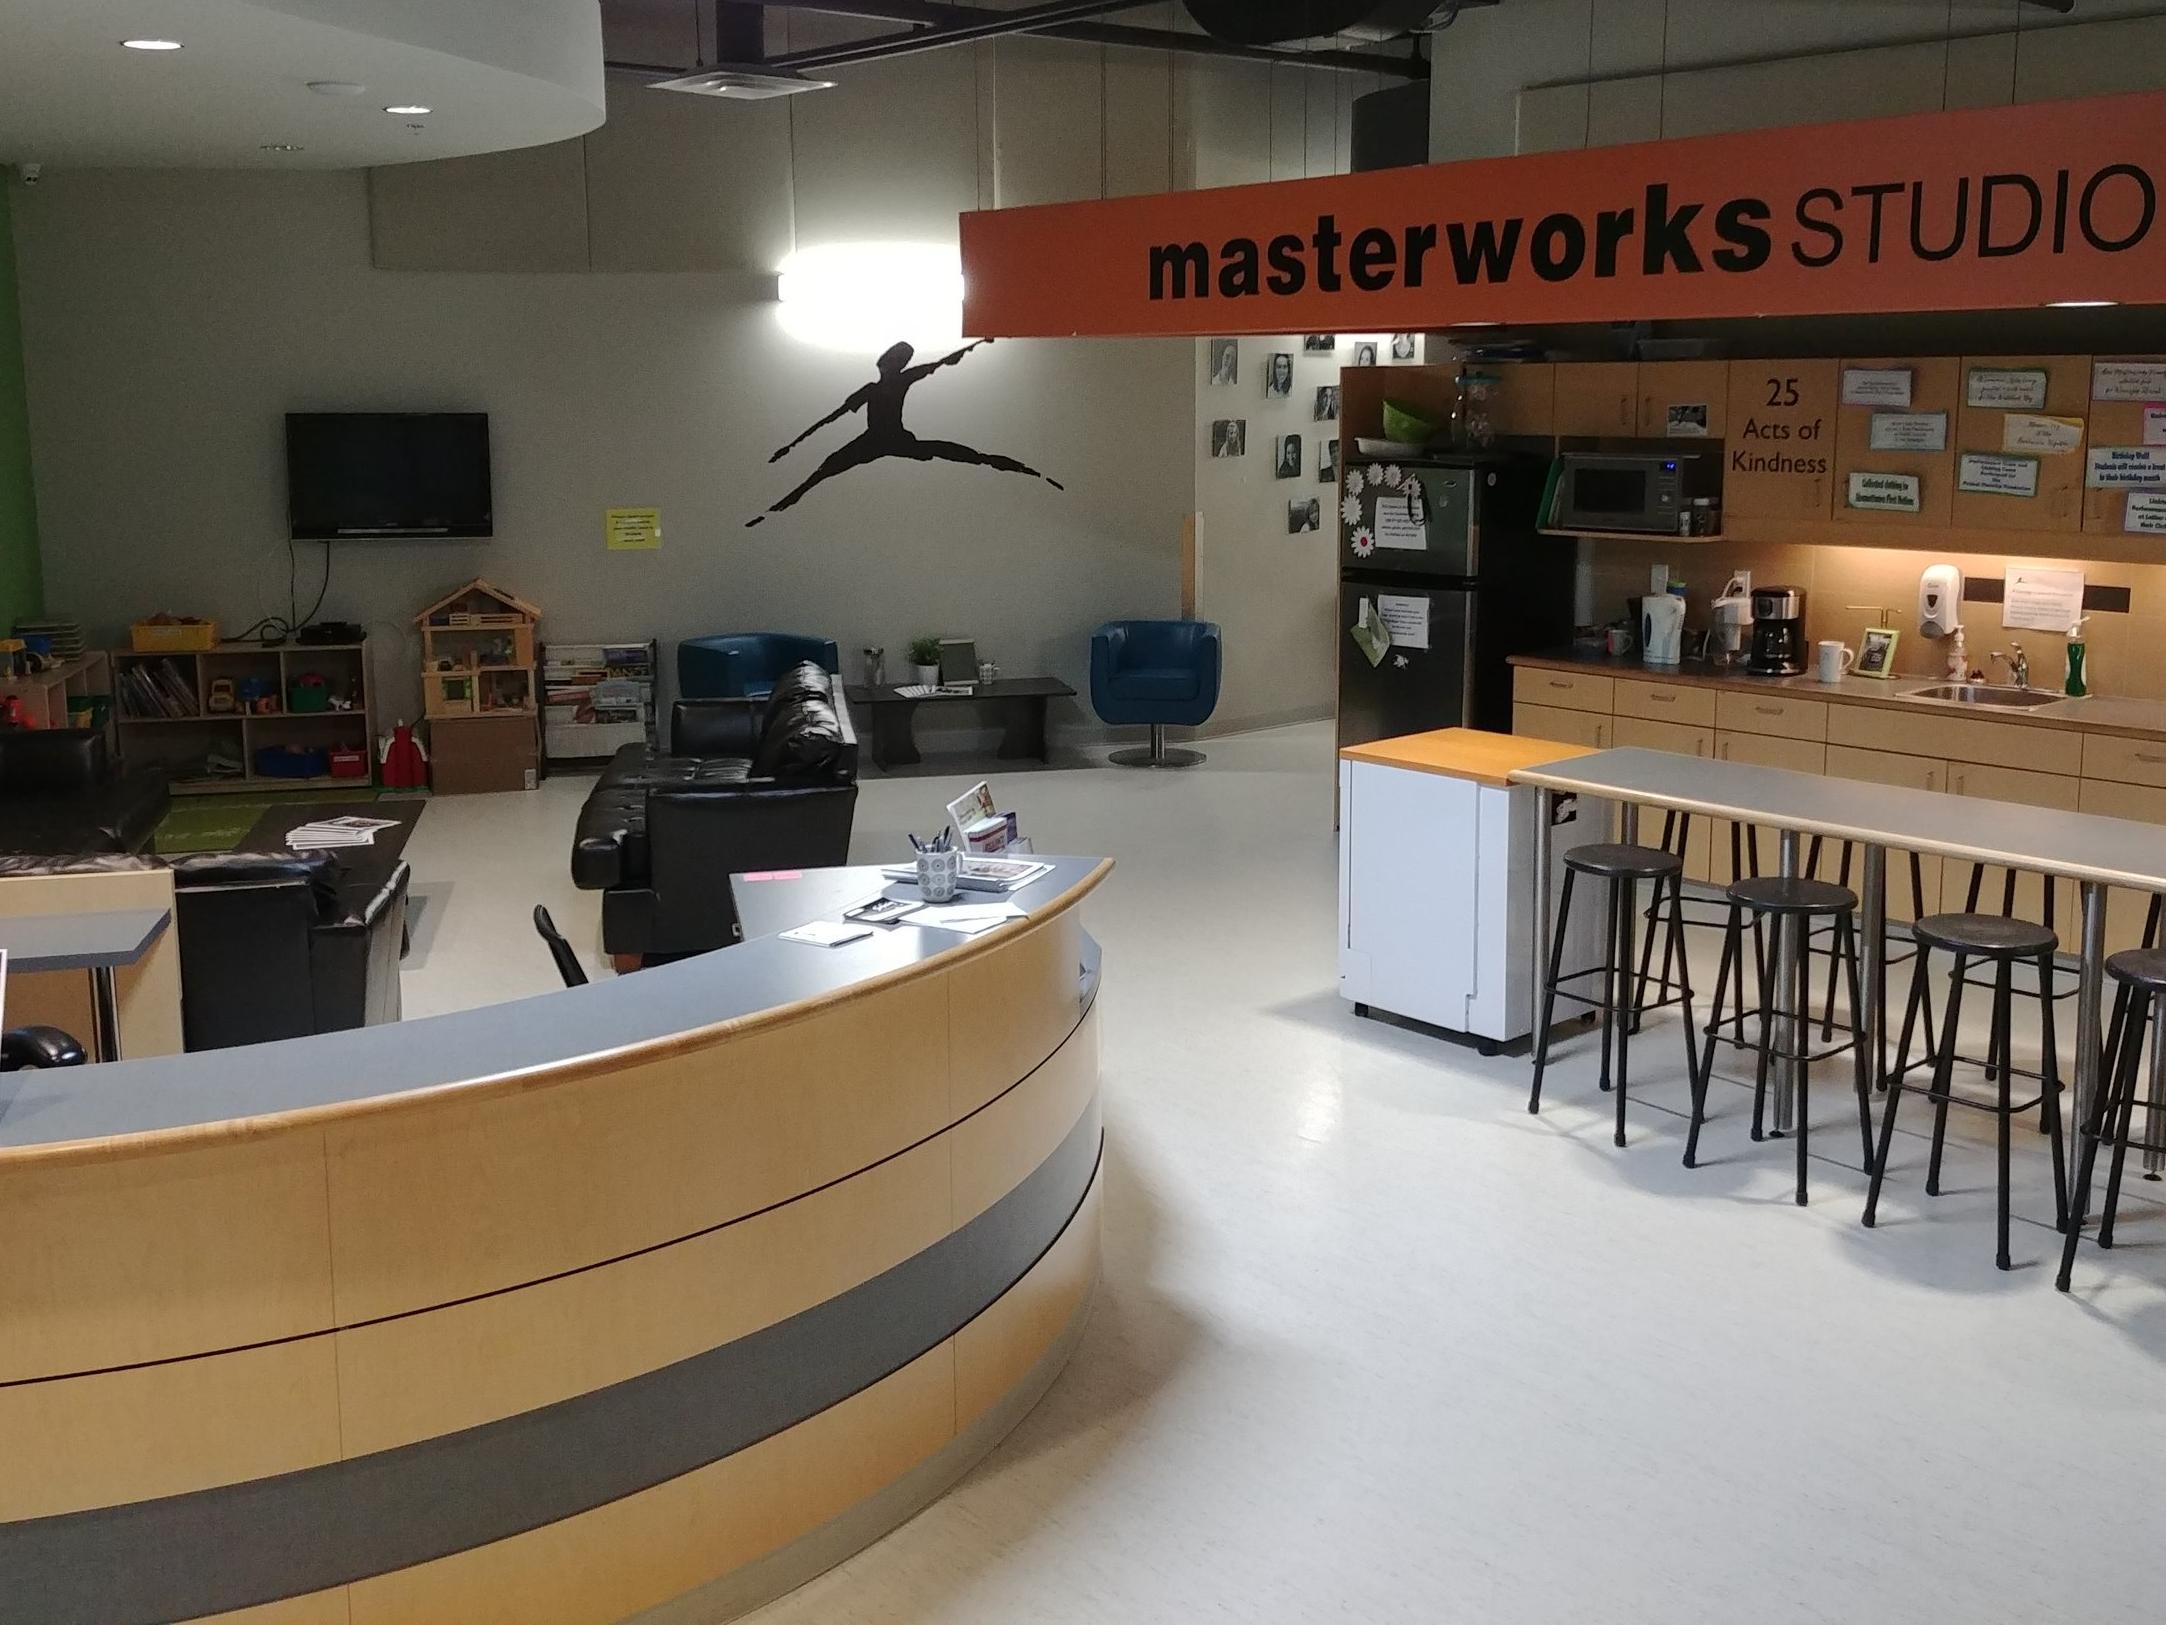 masterworks lobby area